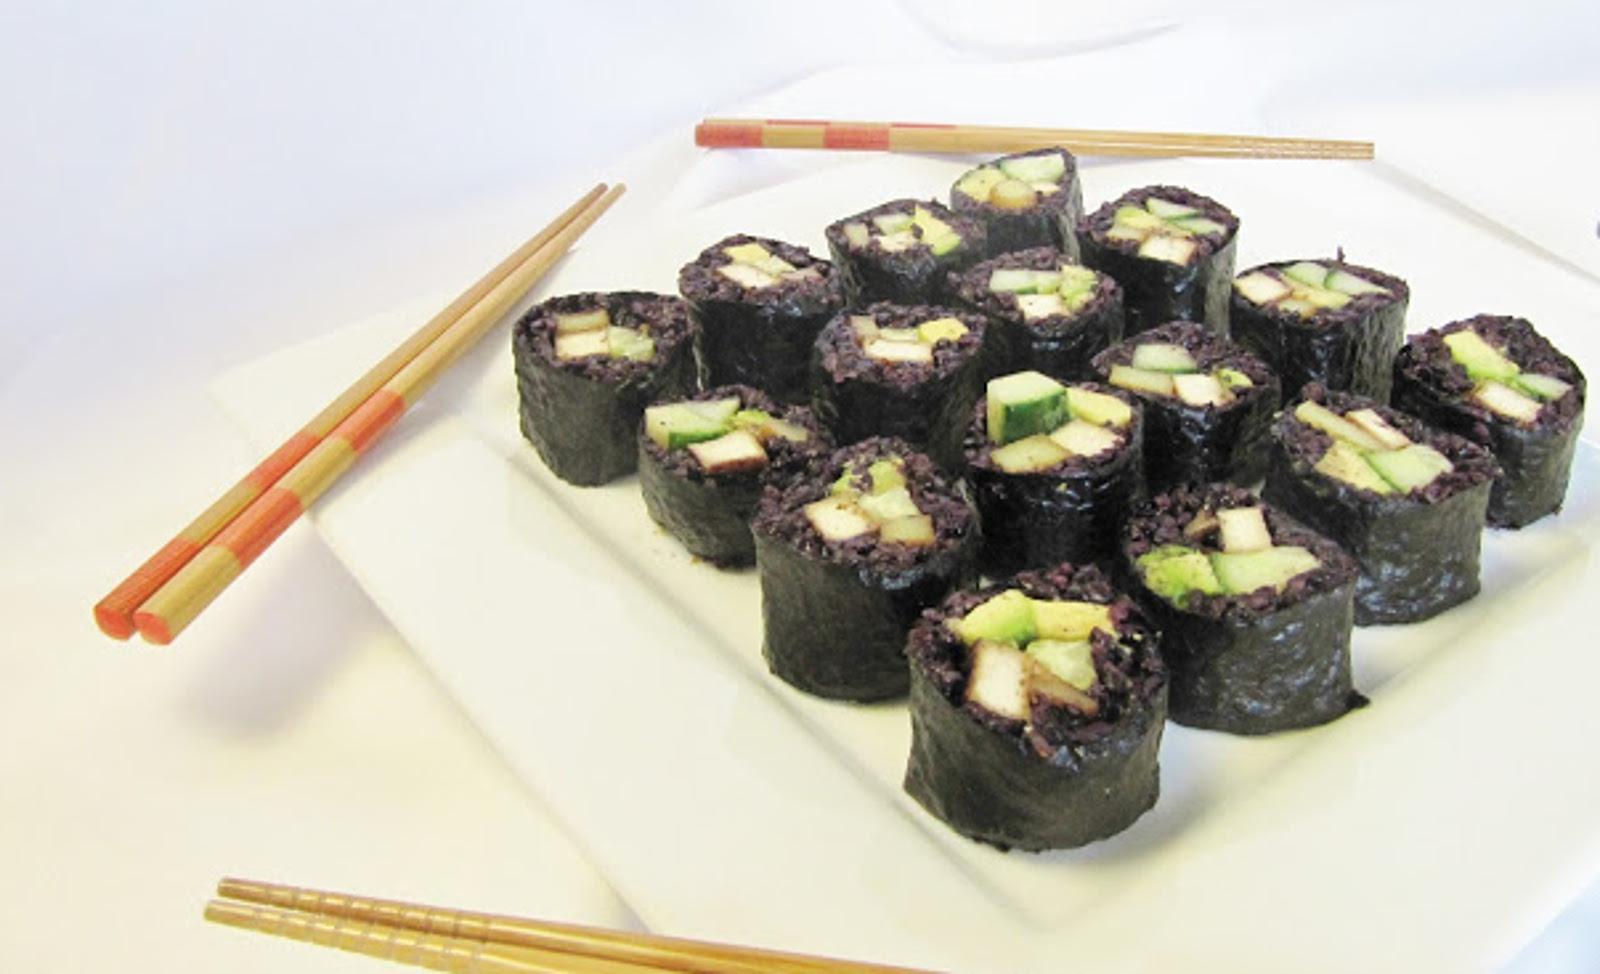 Teriyaki Tofu Roll With Avocado, Cucumber, Potato, and Black Rice